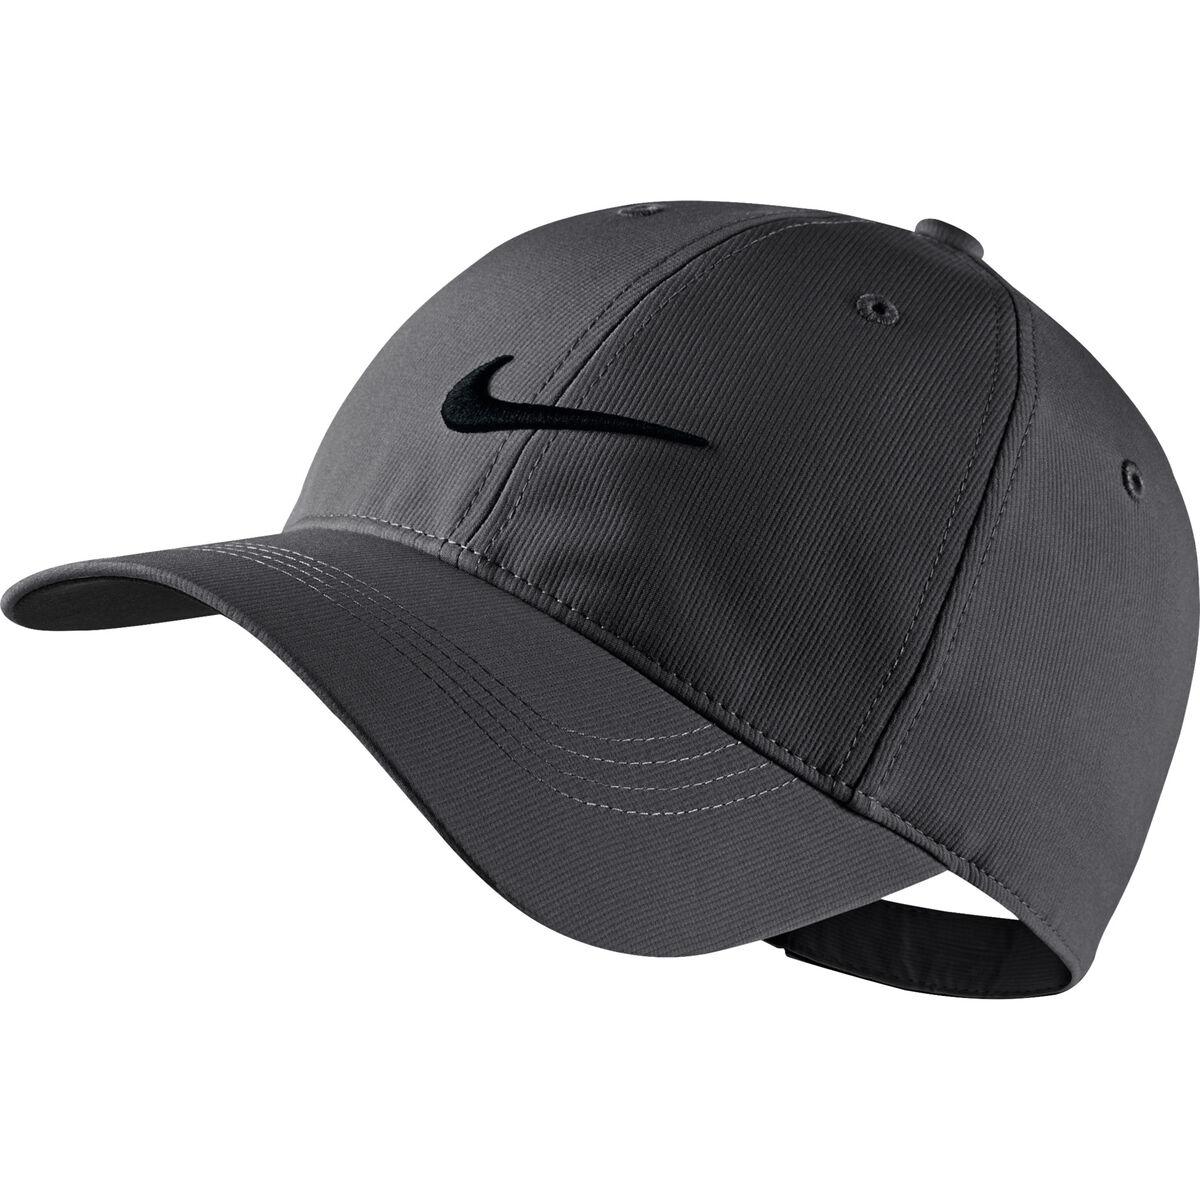 89e84ec75e58f Images. Nike Legacy 91 Tech Hat